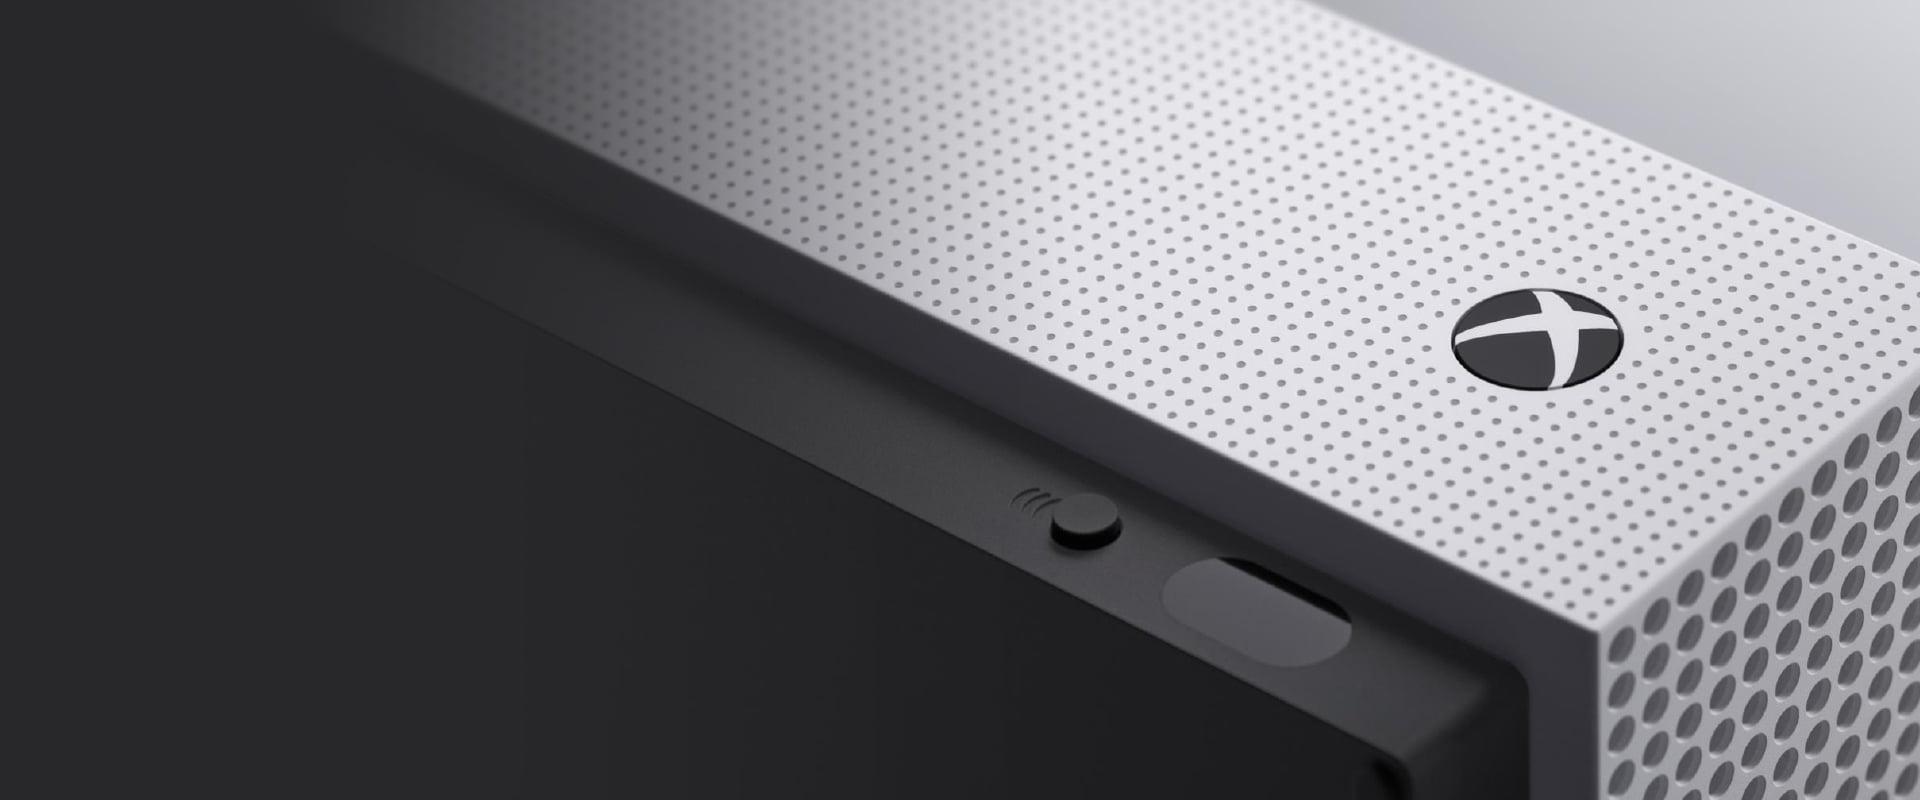 Xbox One busca evolucionar